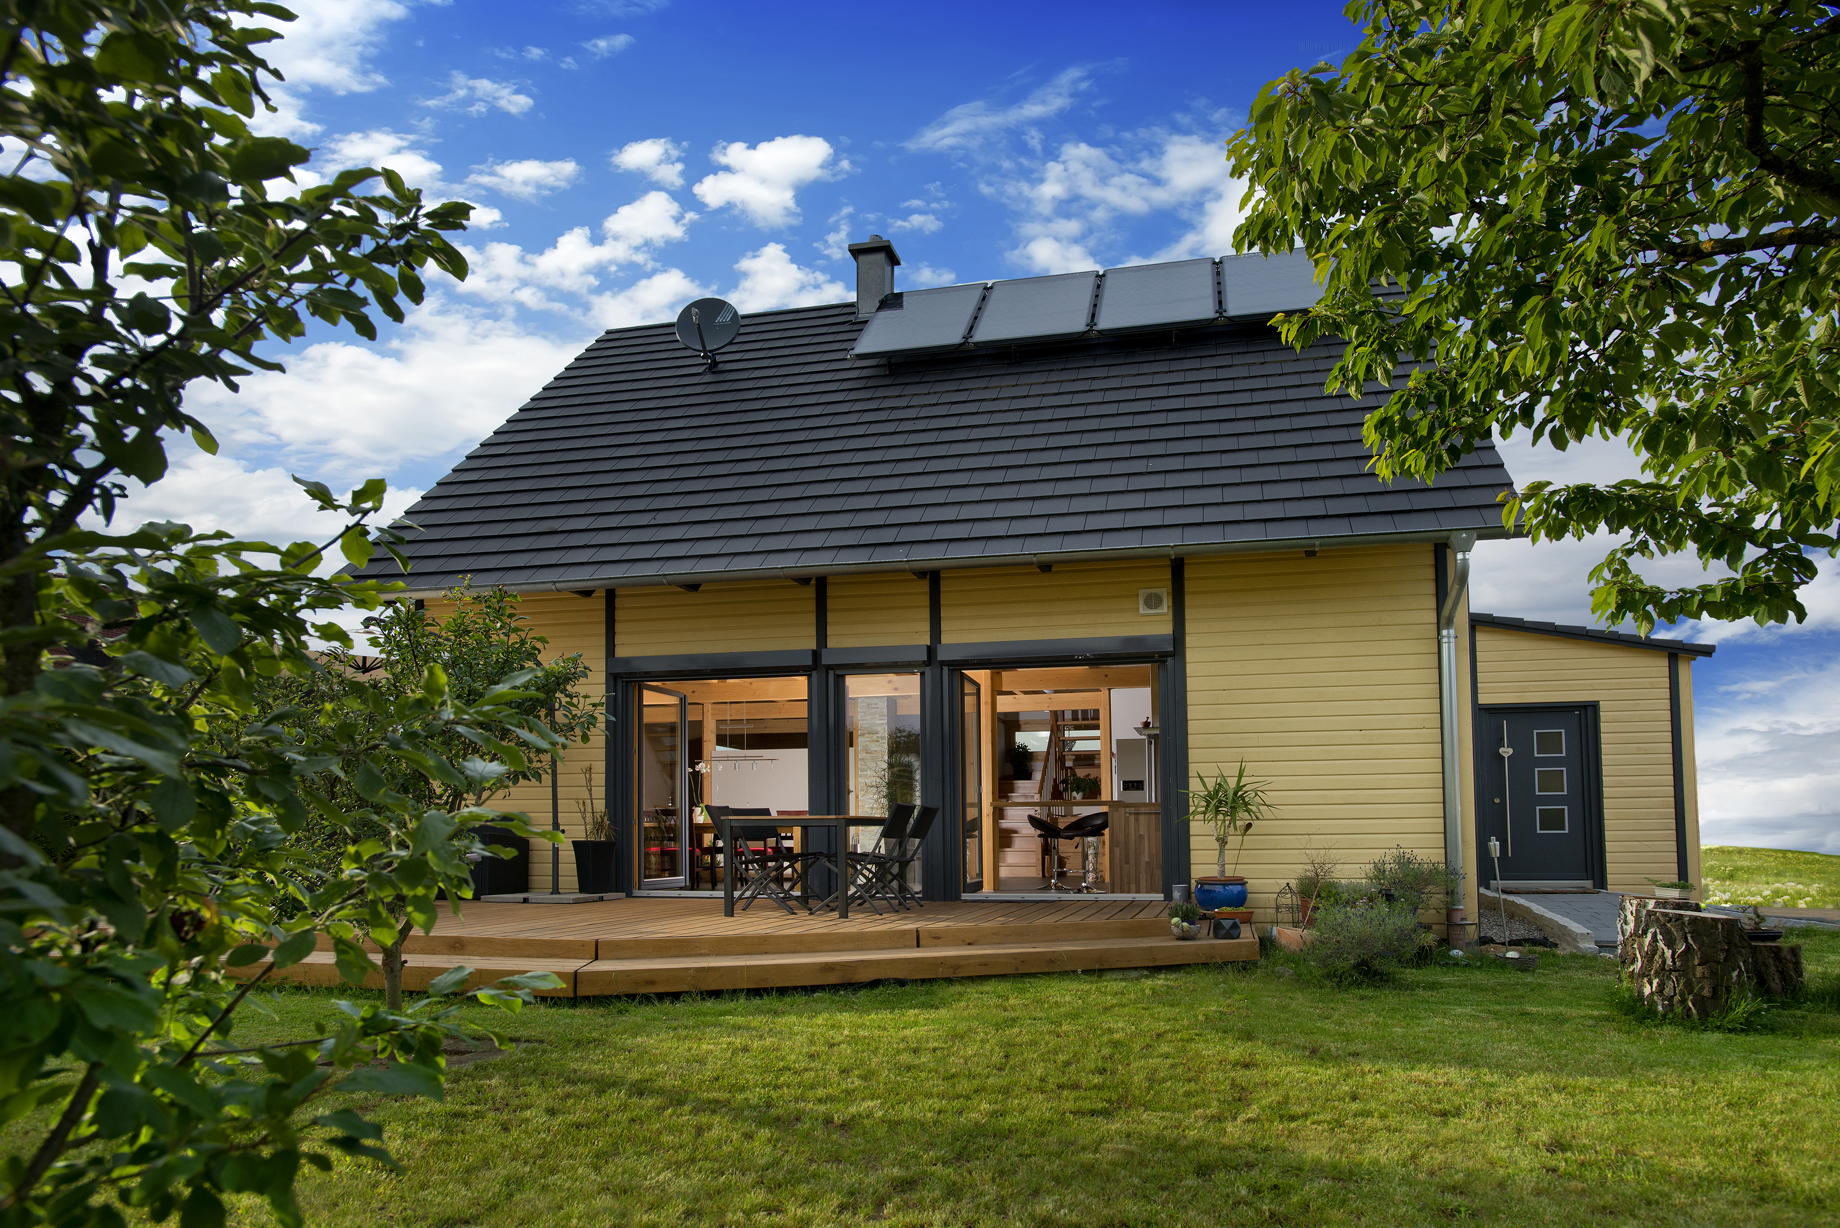 Holzhaus Pleinfeld: Einfamilienhaus